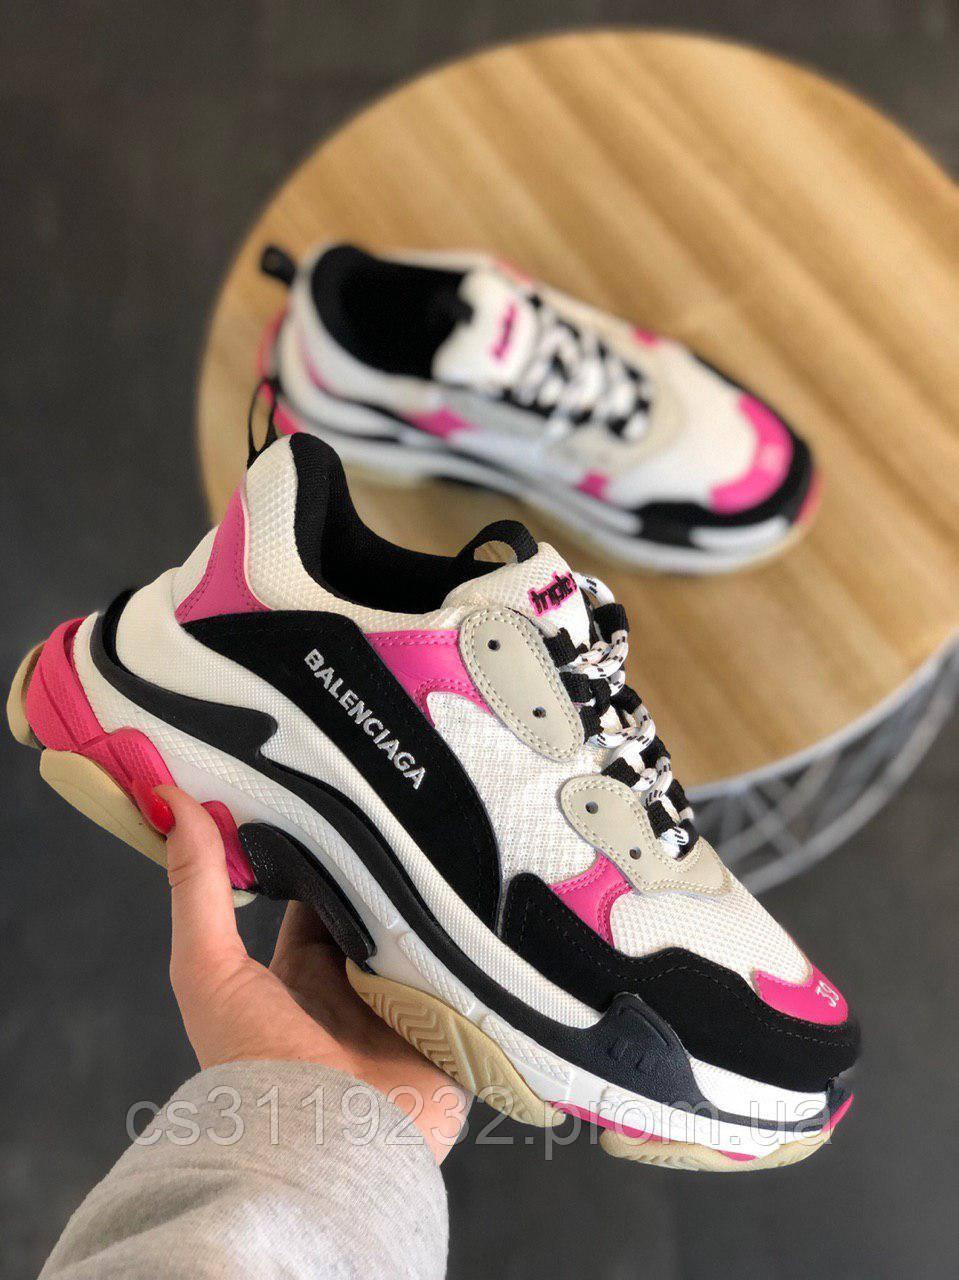 Женские кроссовки Balenciaga Triple S White Black Pink (бело-черно-розовый)